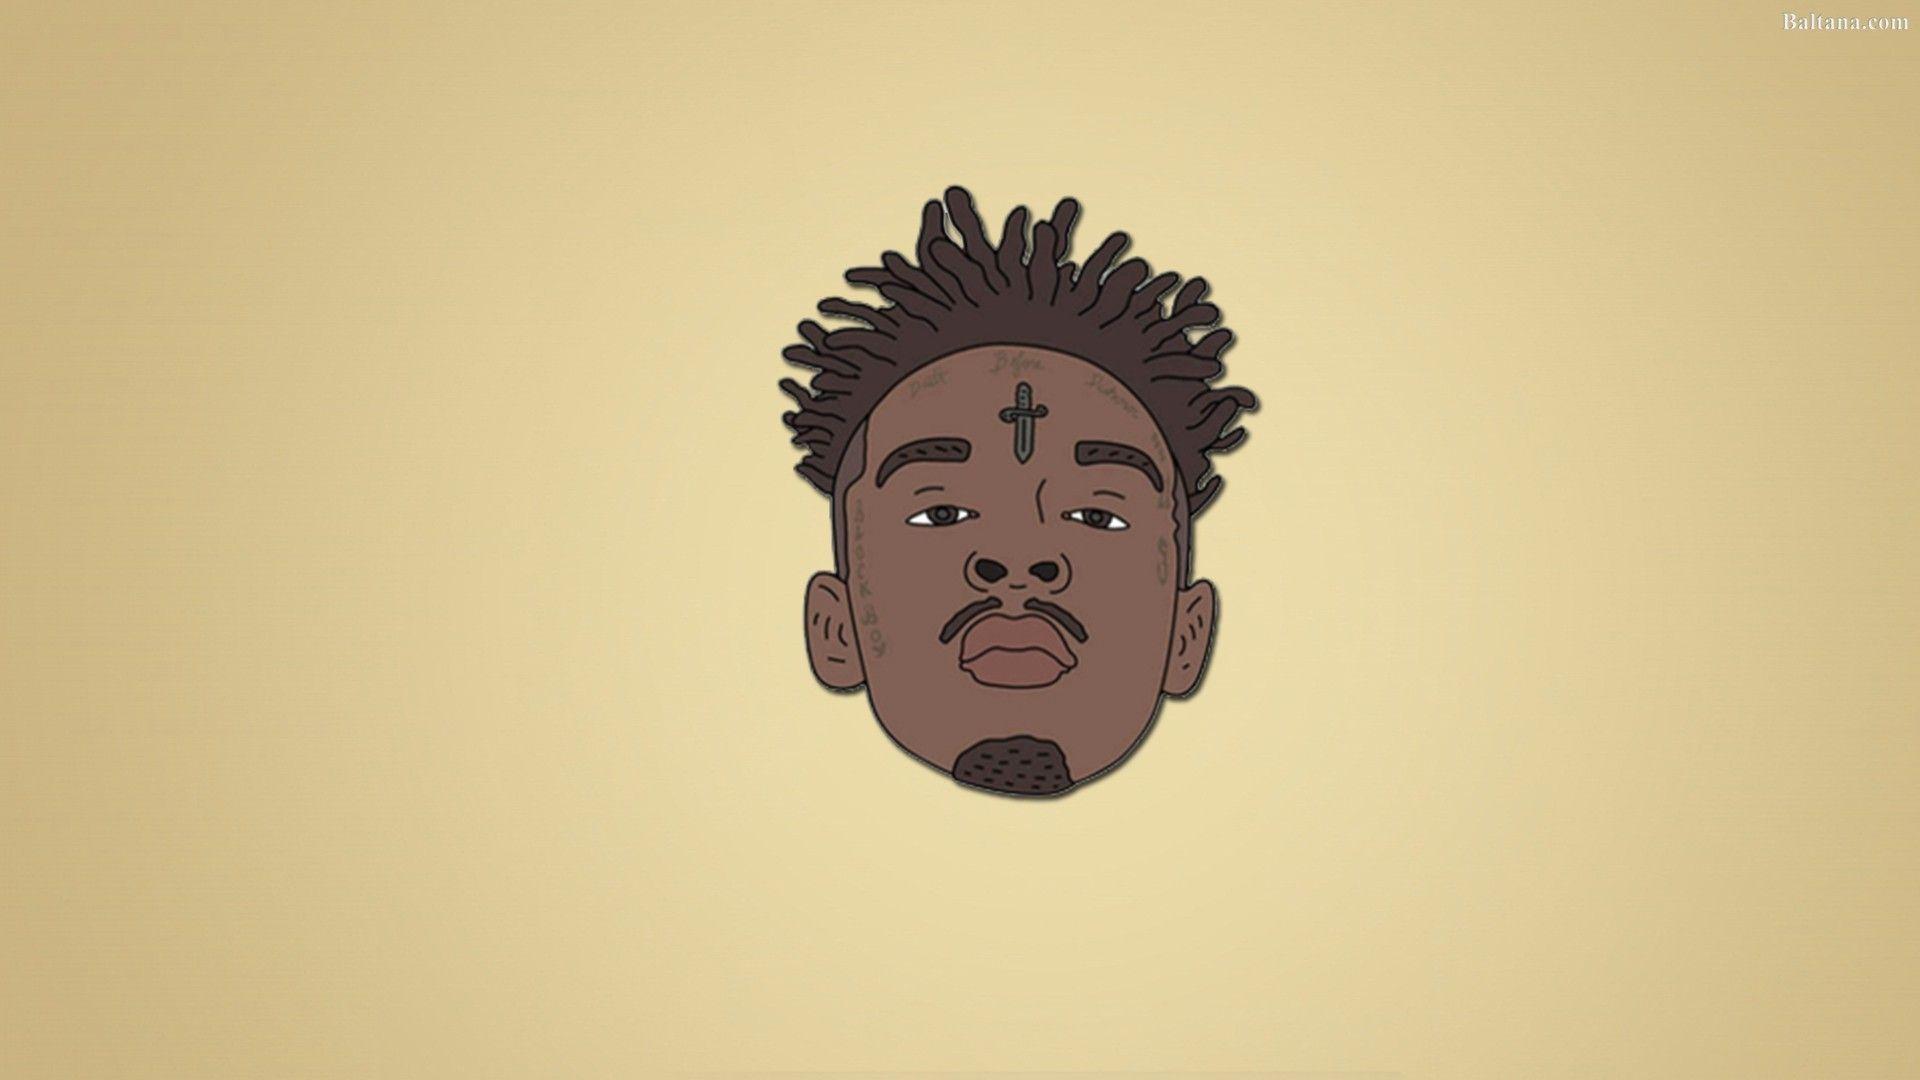 NBA Young Boy Cartoon Wallpapers